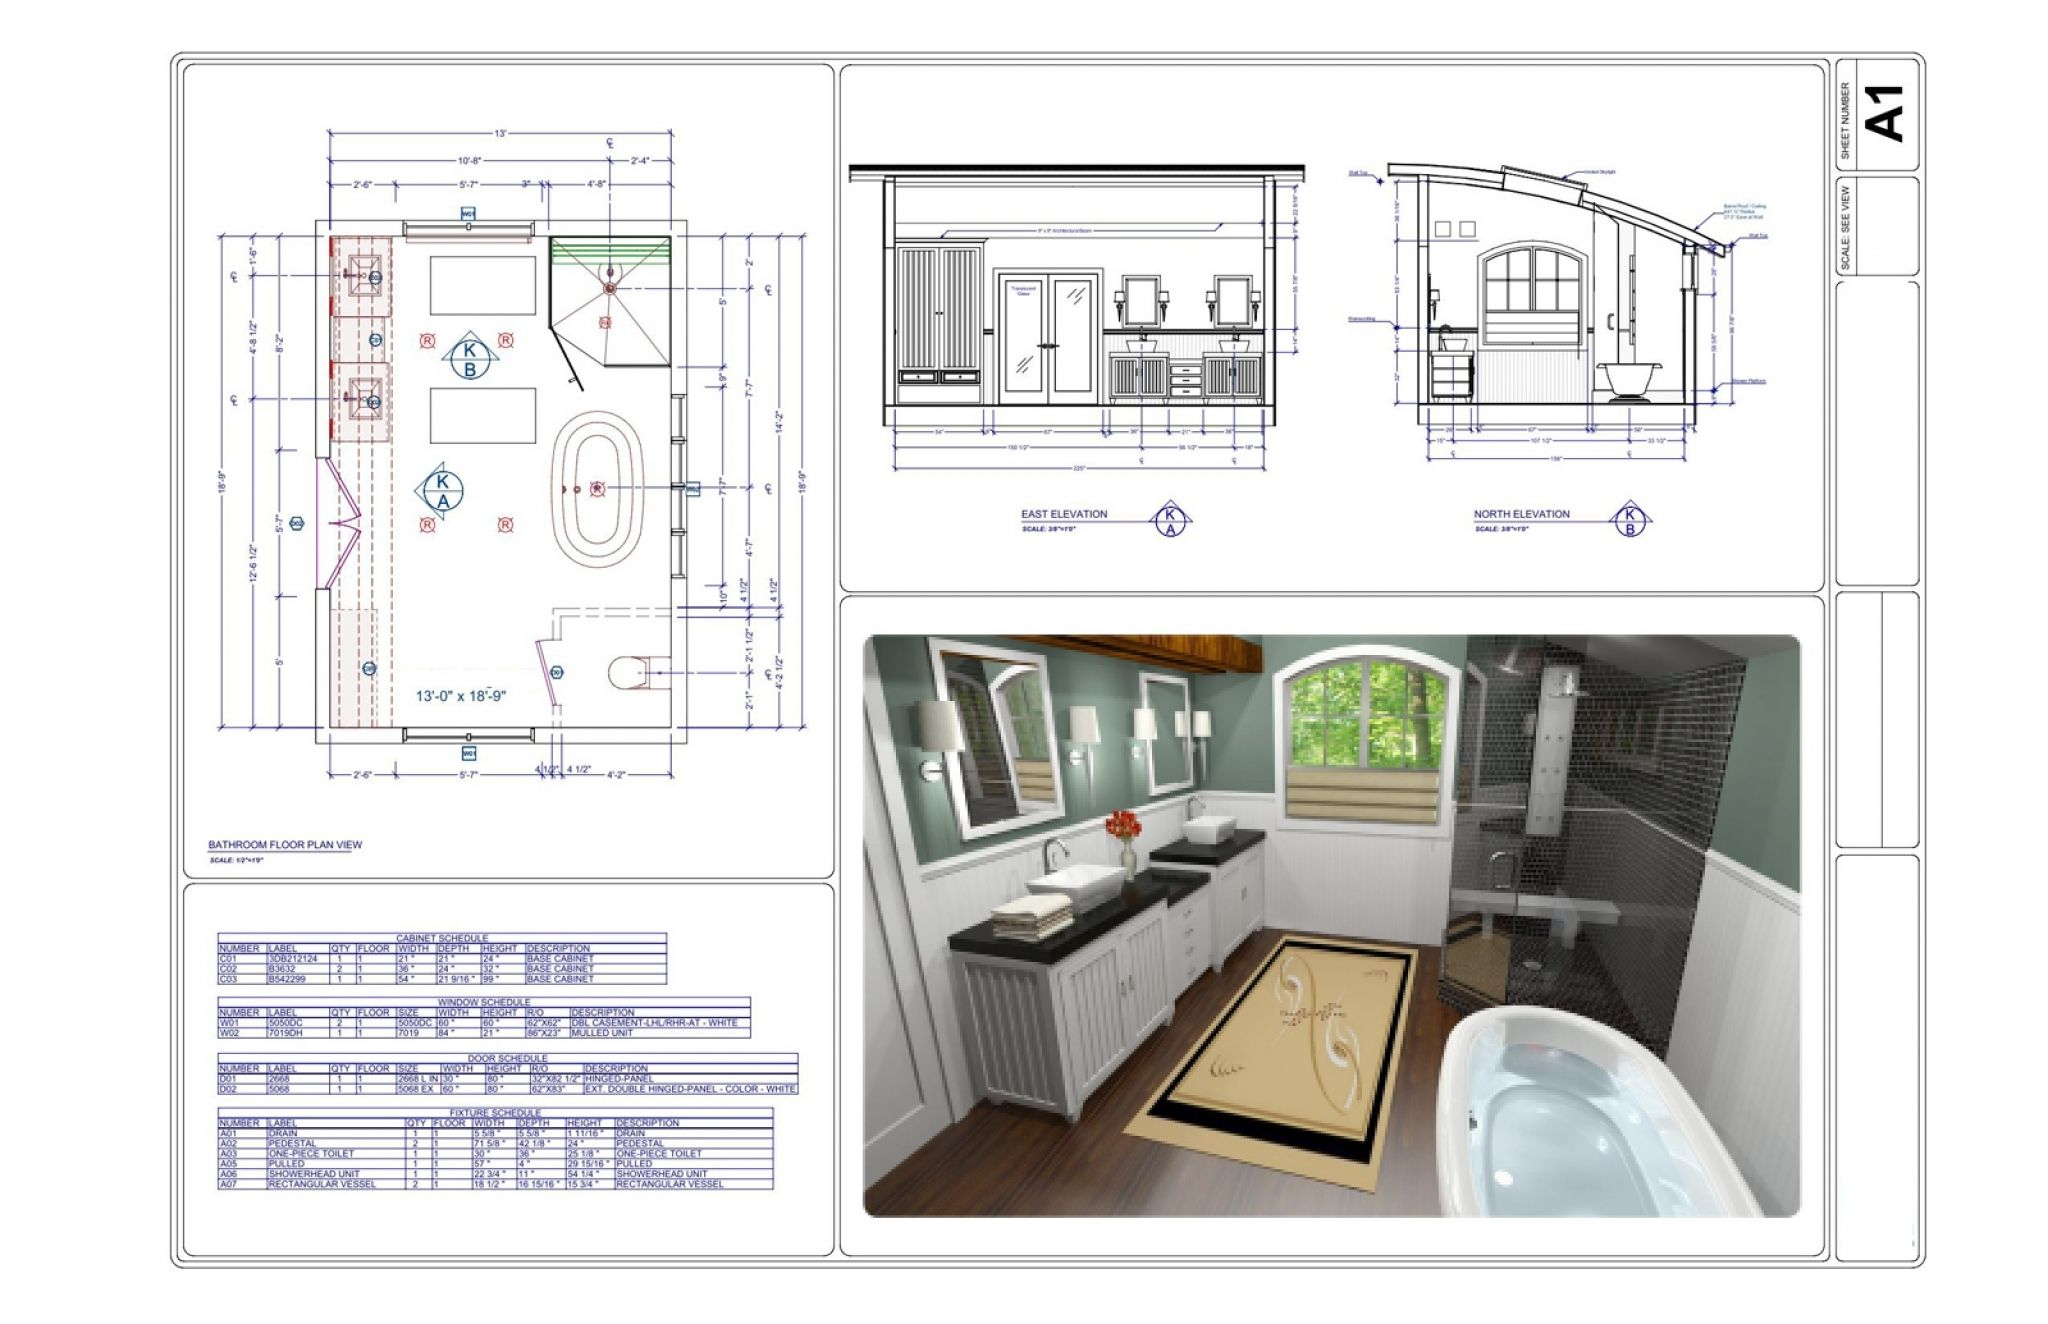 kitchen cabinets layout software - diy kitchen countertop ideas ...